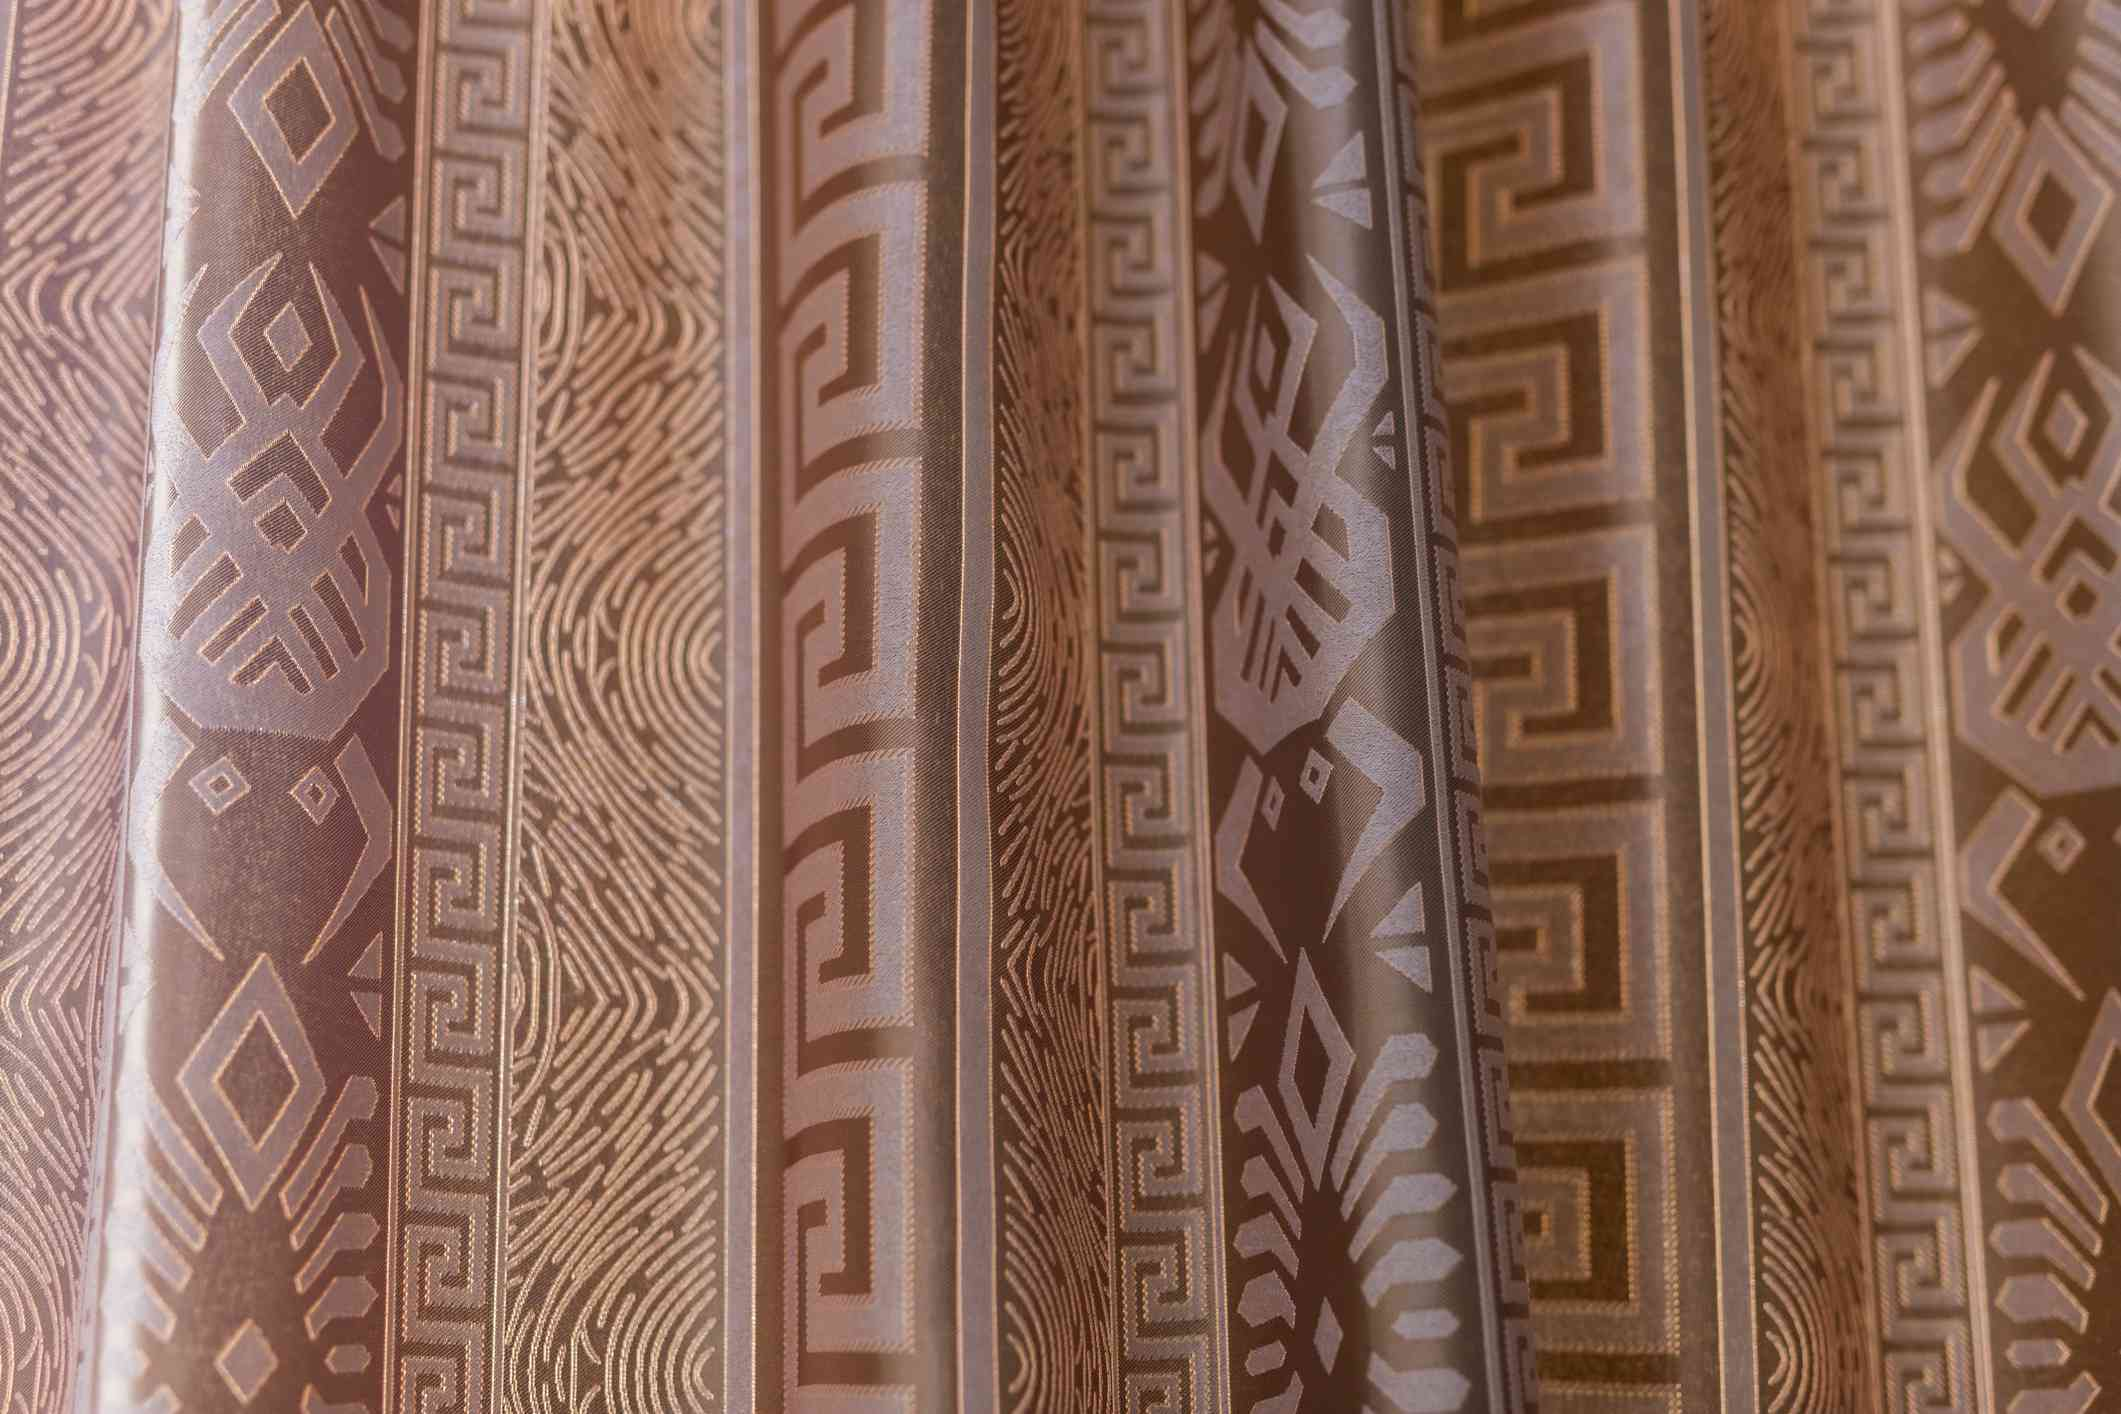 Greek key print on curtains